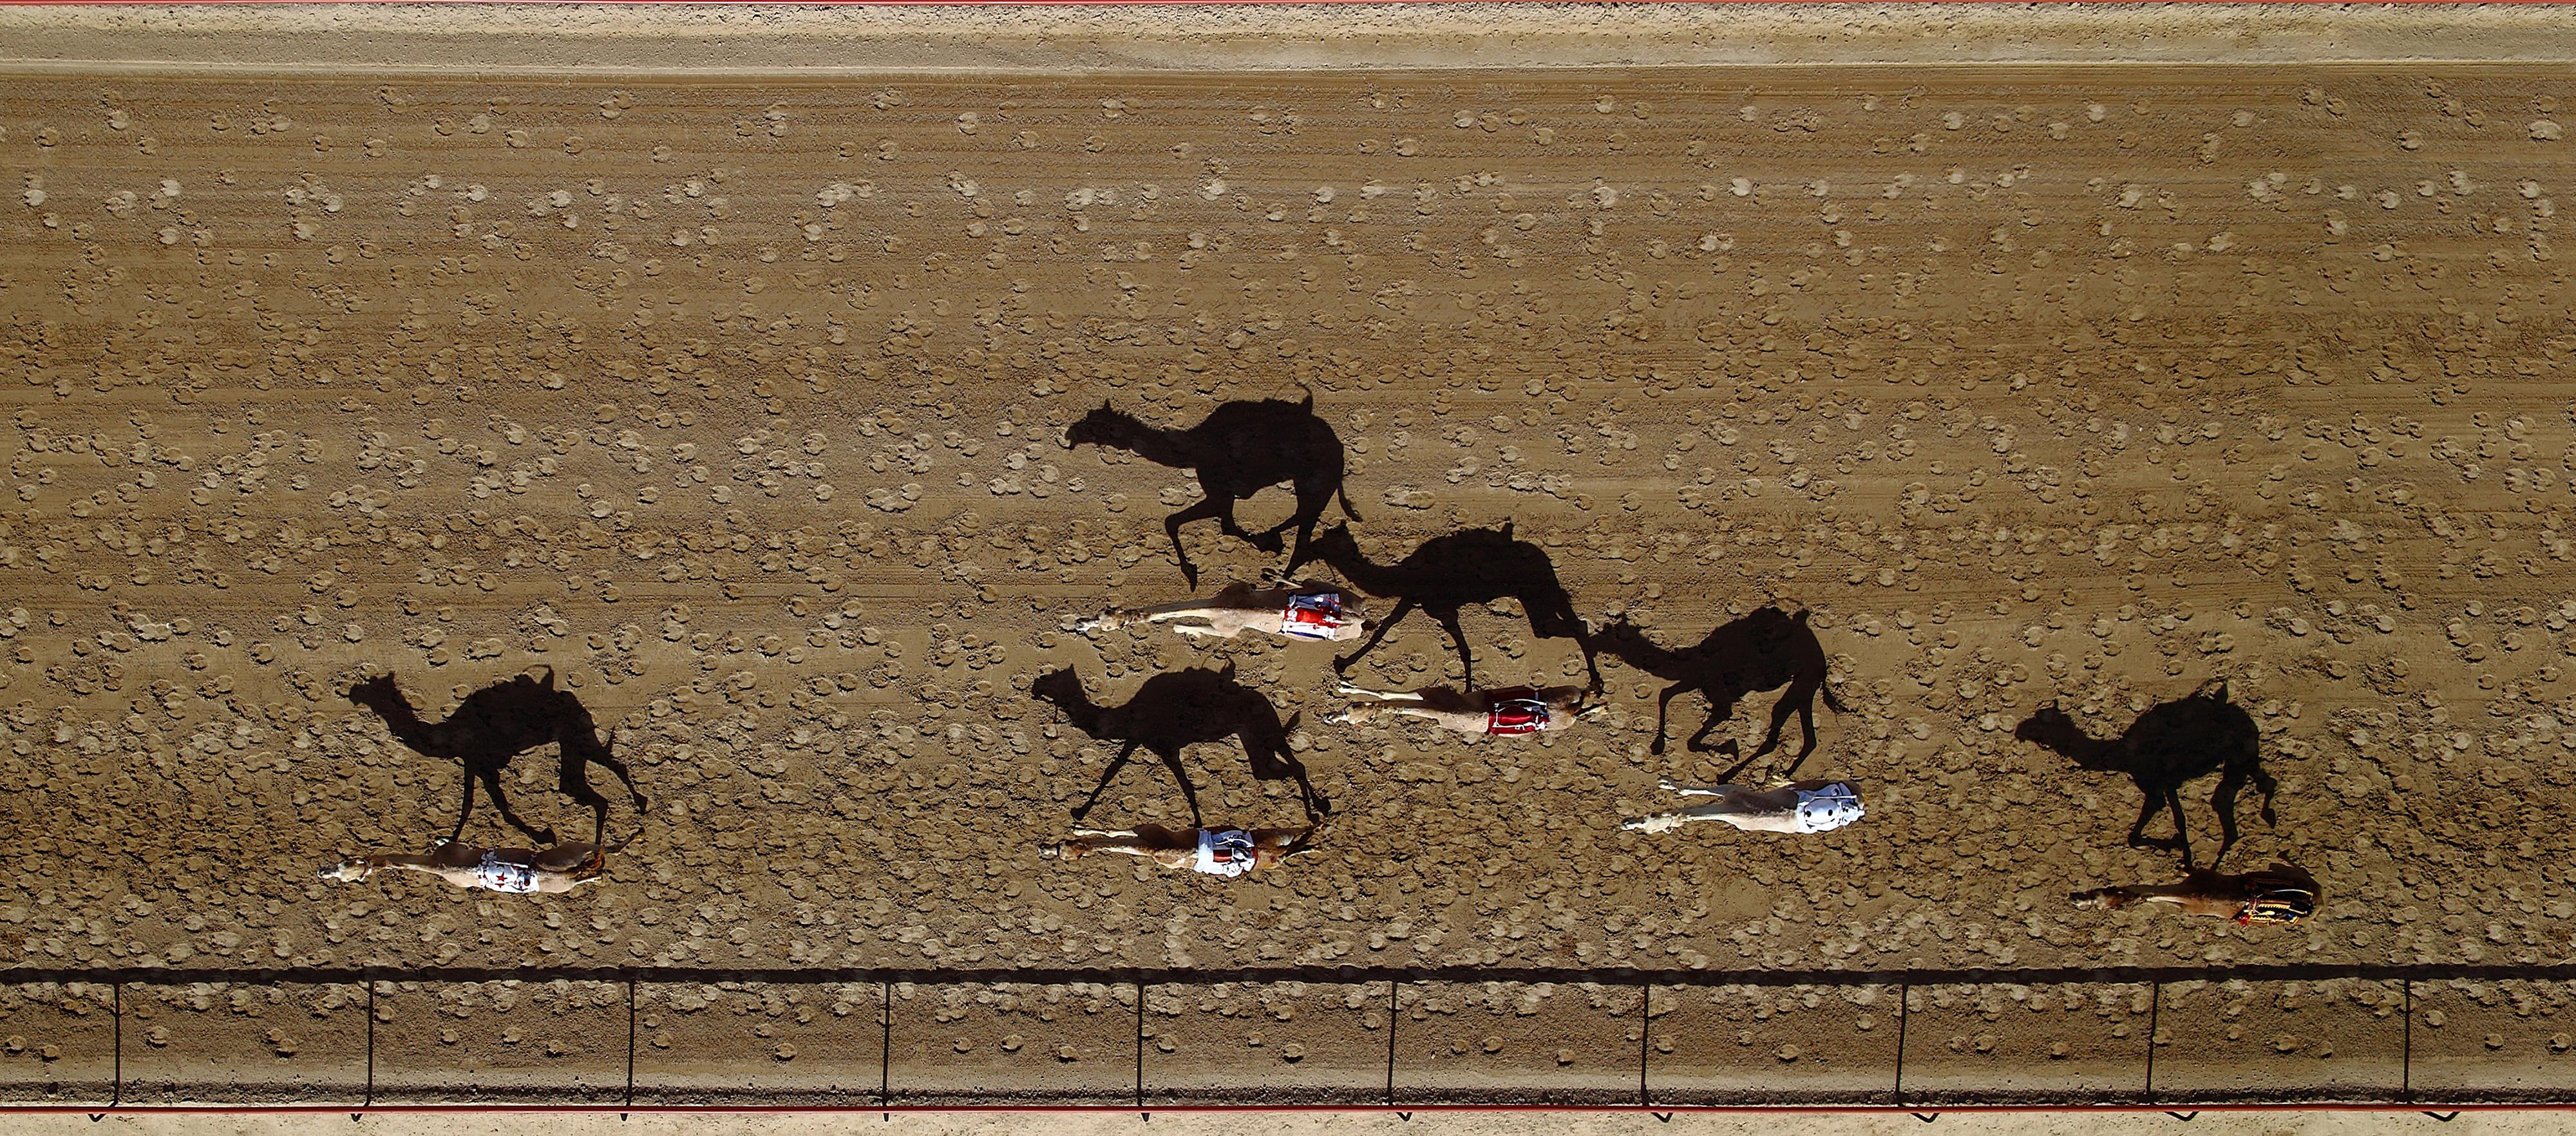 Al Marmoum Race Track, Dubai, UAE